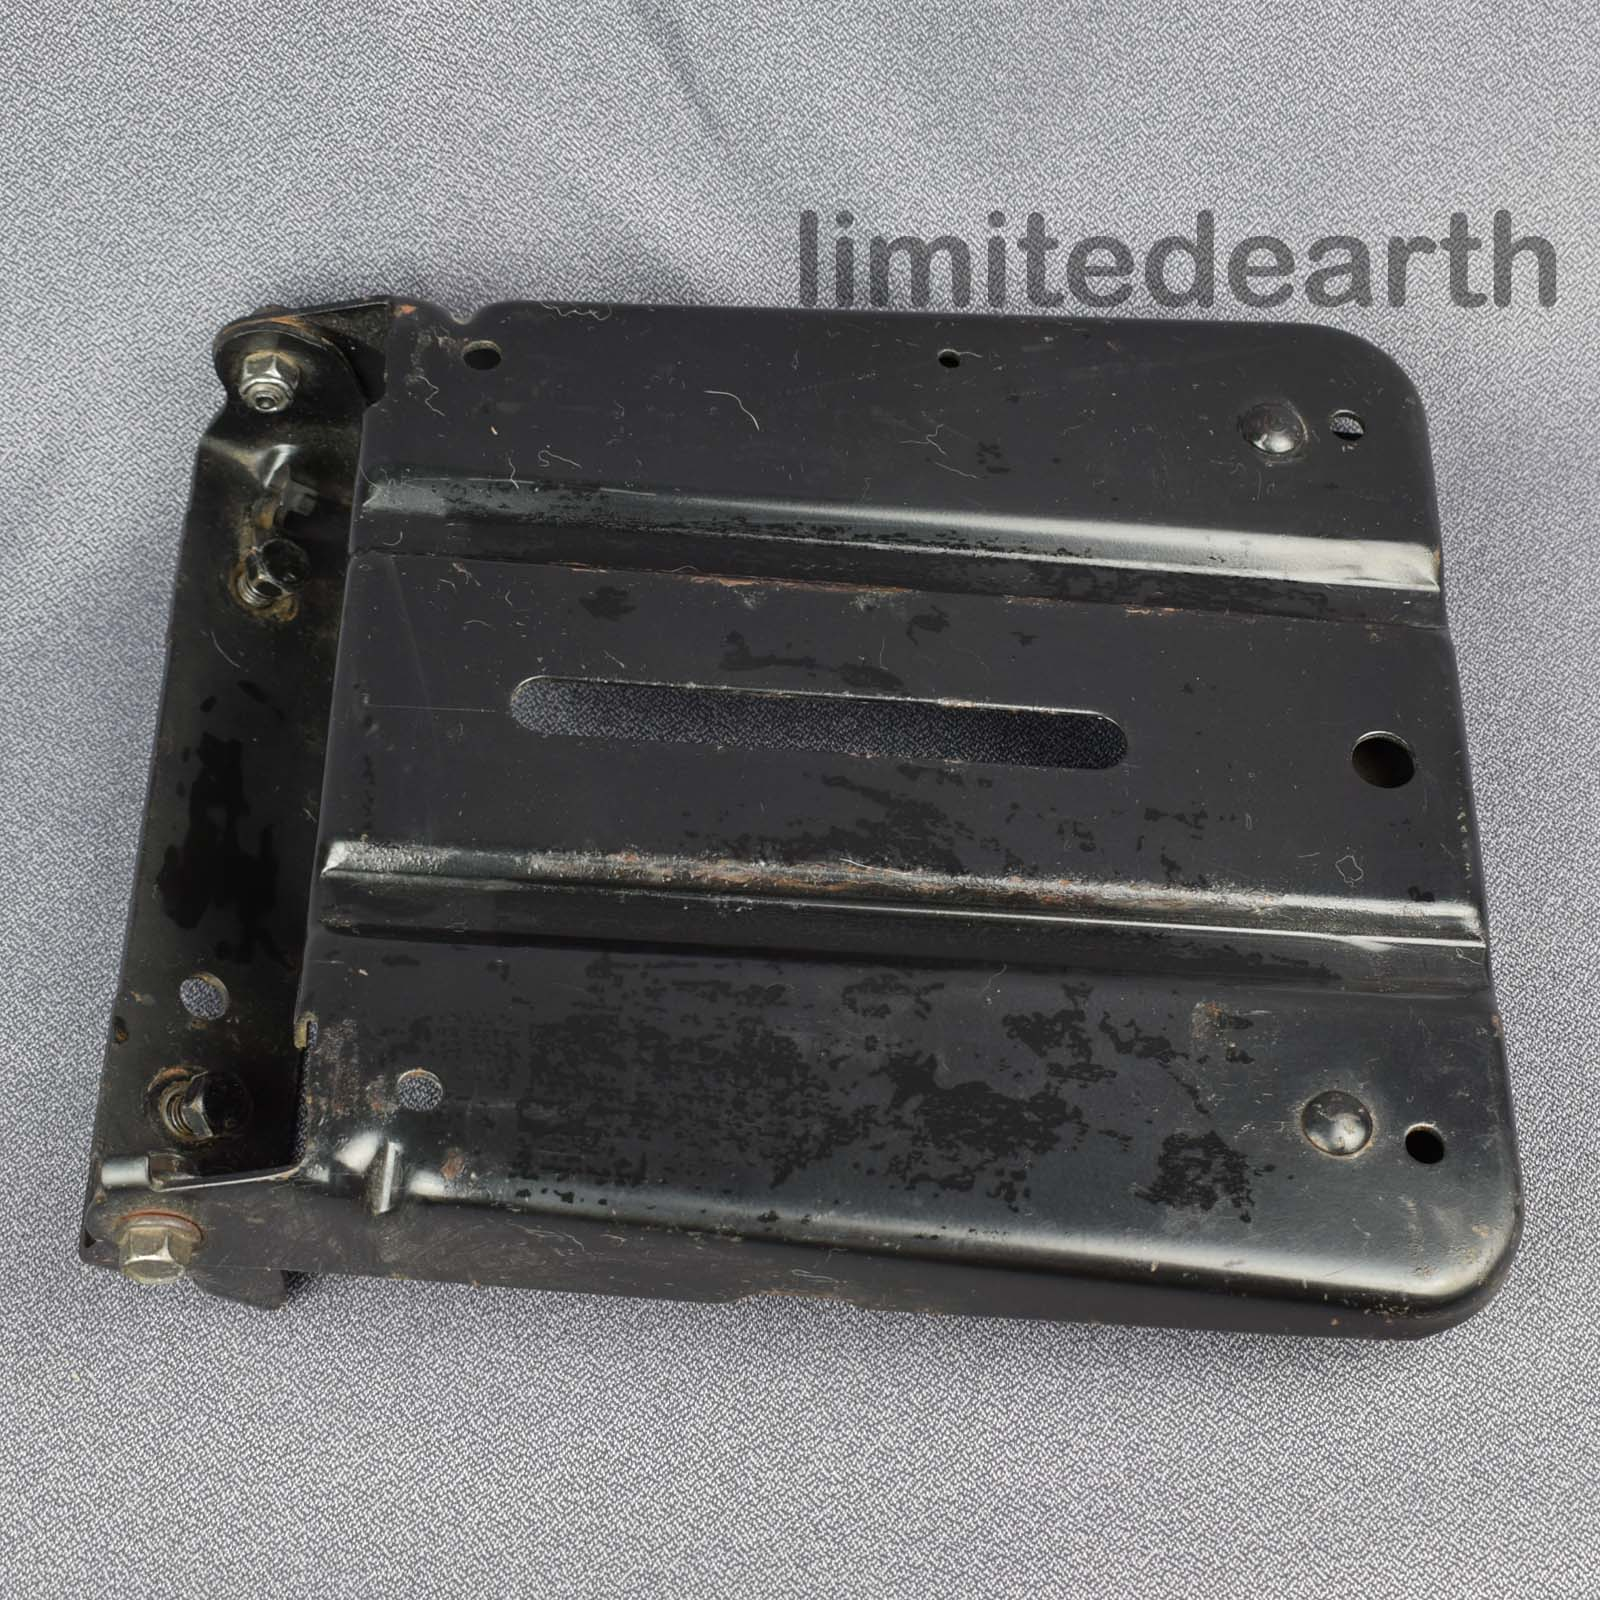 Details about Craftsman AYP riding mower seat pan 140552 155925 195530  brackets safety switch